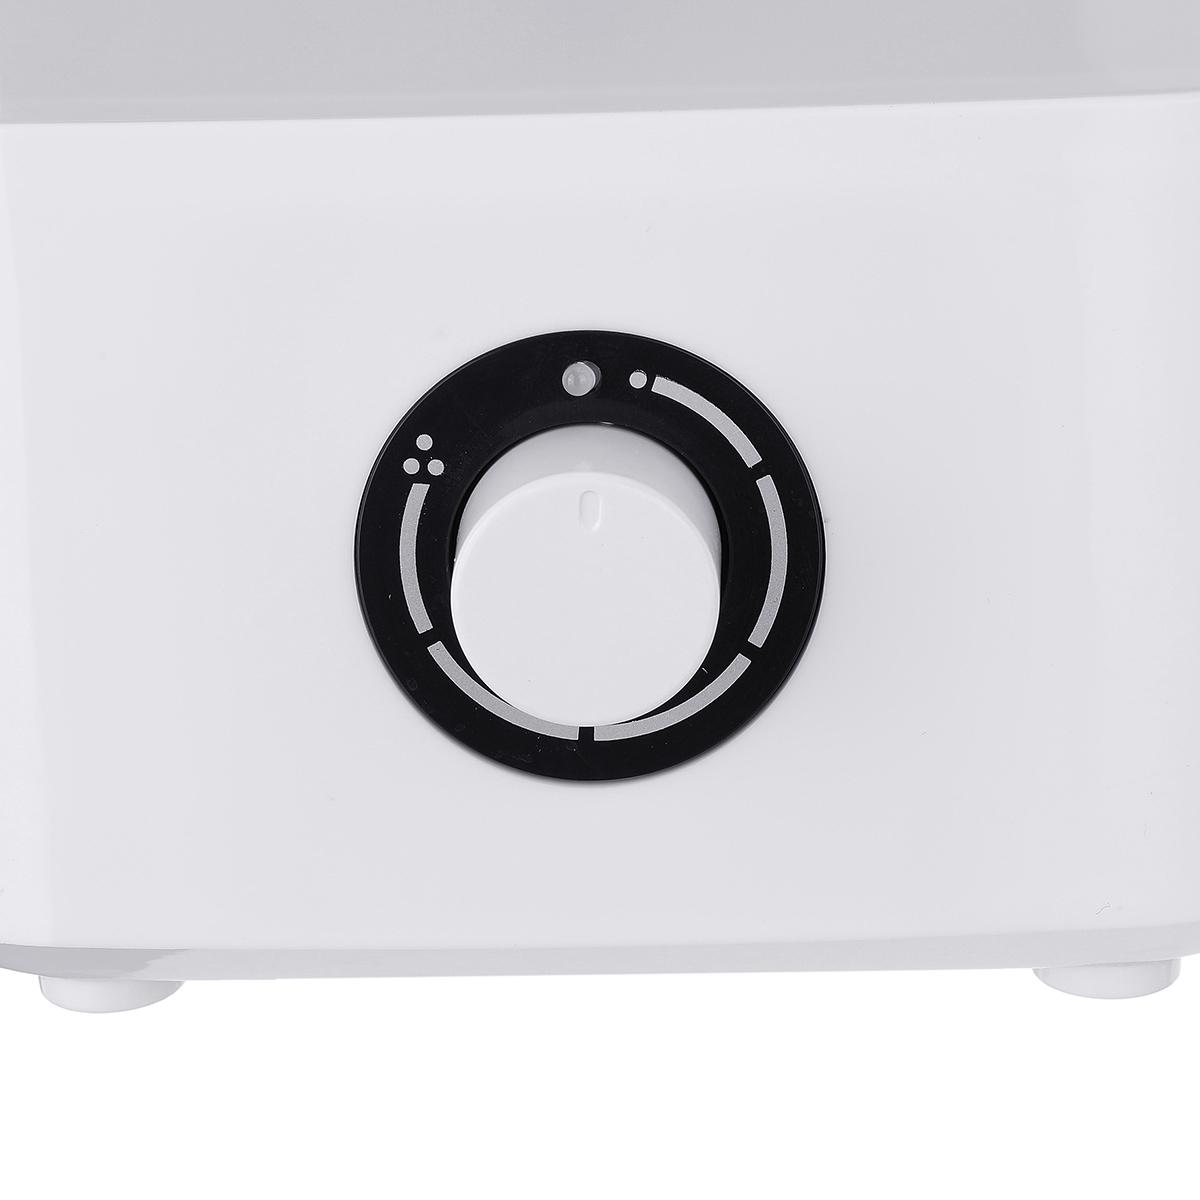 4L 300ml/hr Ultrasonic Humidifier 360 Cool Mist Diffuser Air Purifier